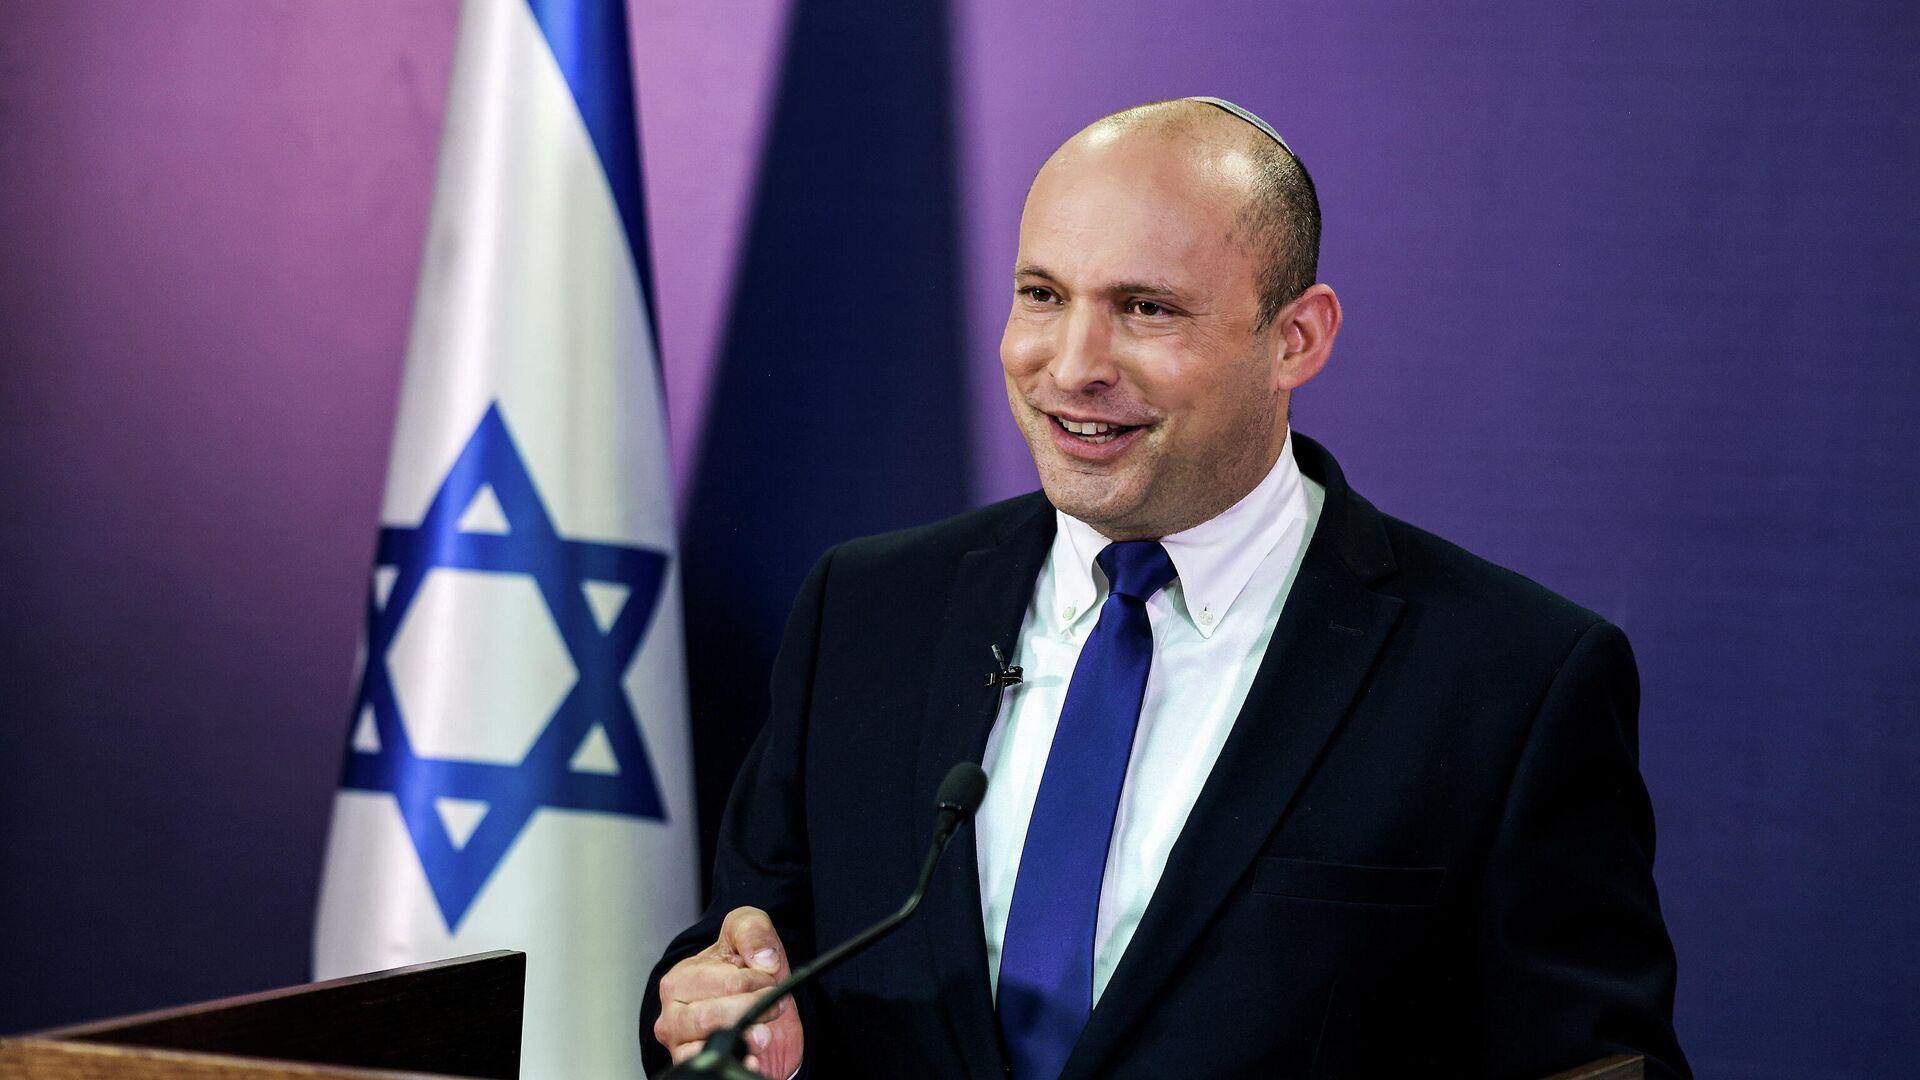 Il Primo ministro di Israele Naftali Bennett - Sputnik Italia, 1920, 14.06.2021